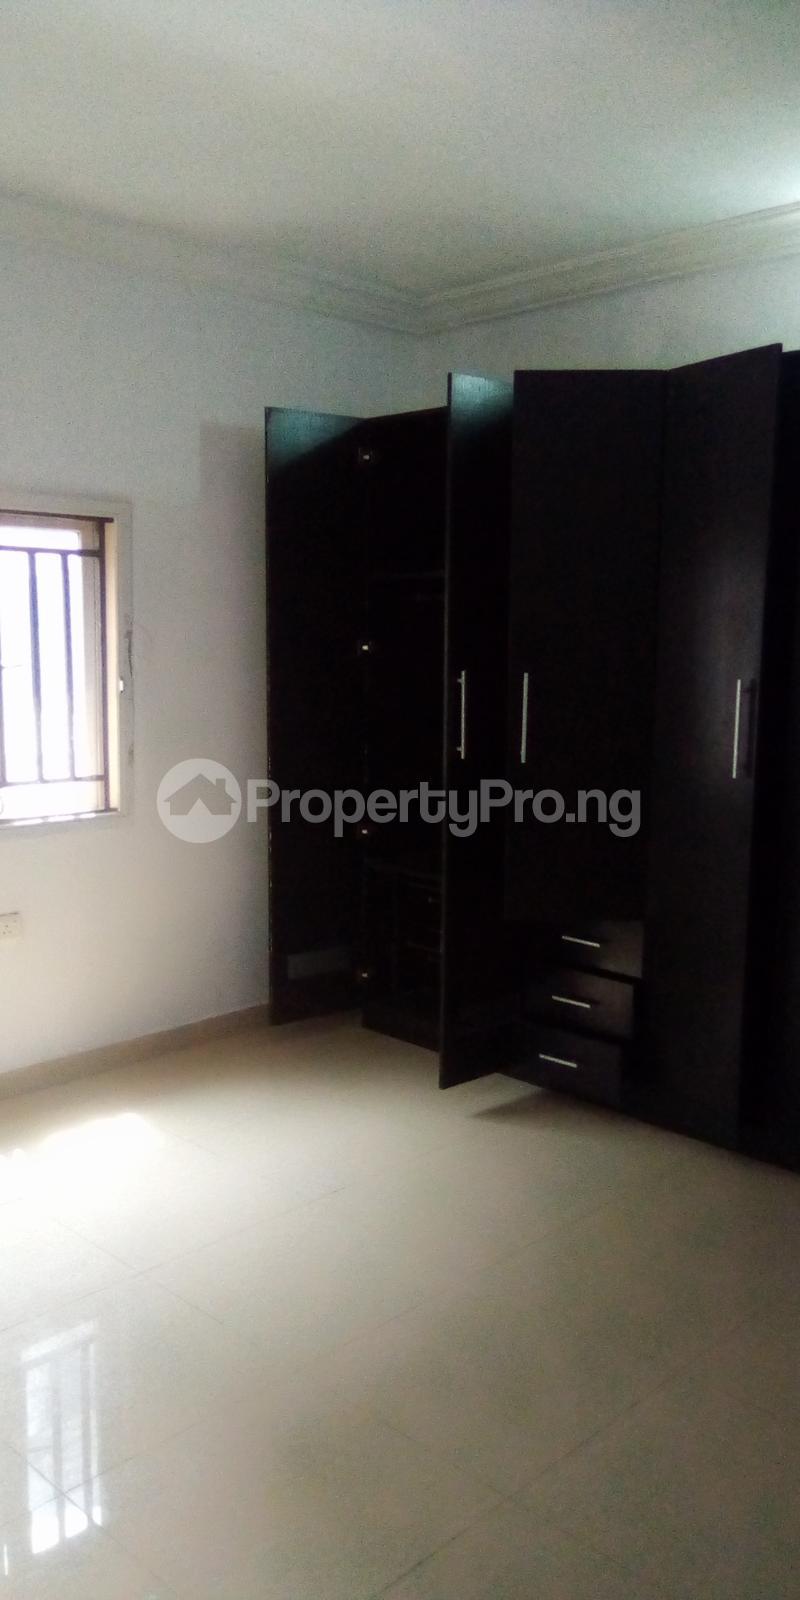 3 bedroom Flat / Apartment for rent Atlantic View Estate Igbo-efon Lekki Lagos - 3